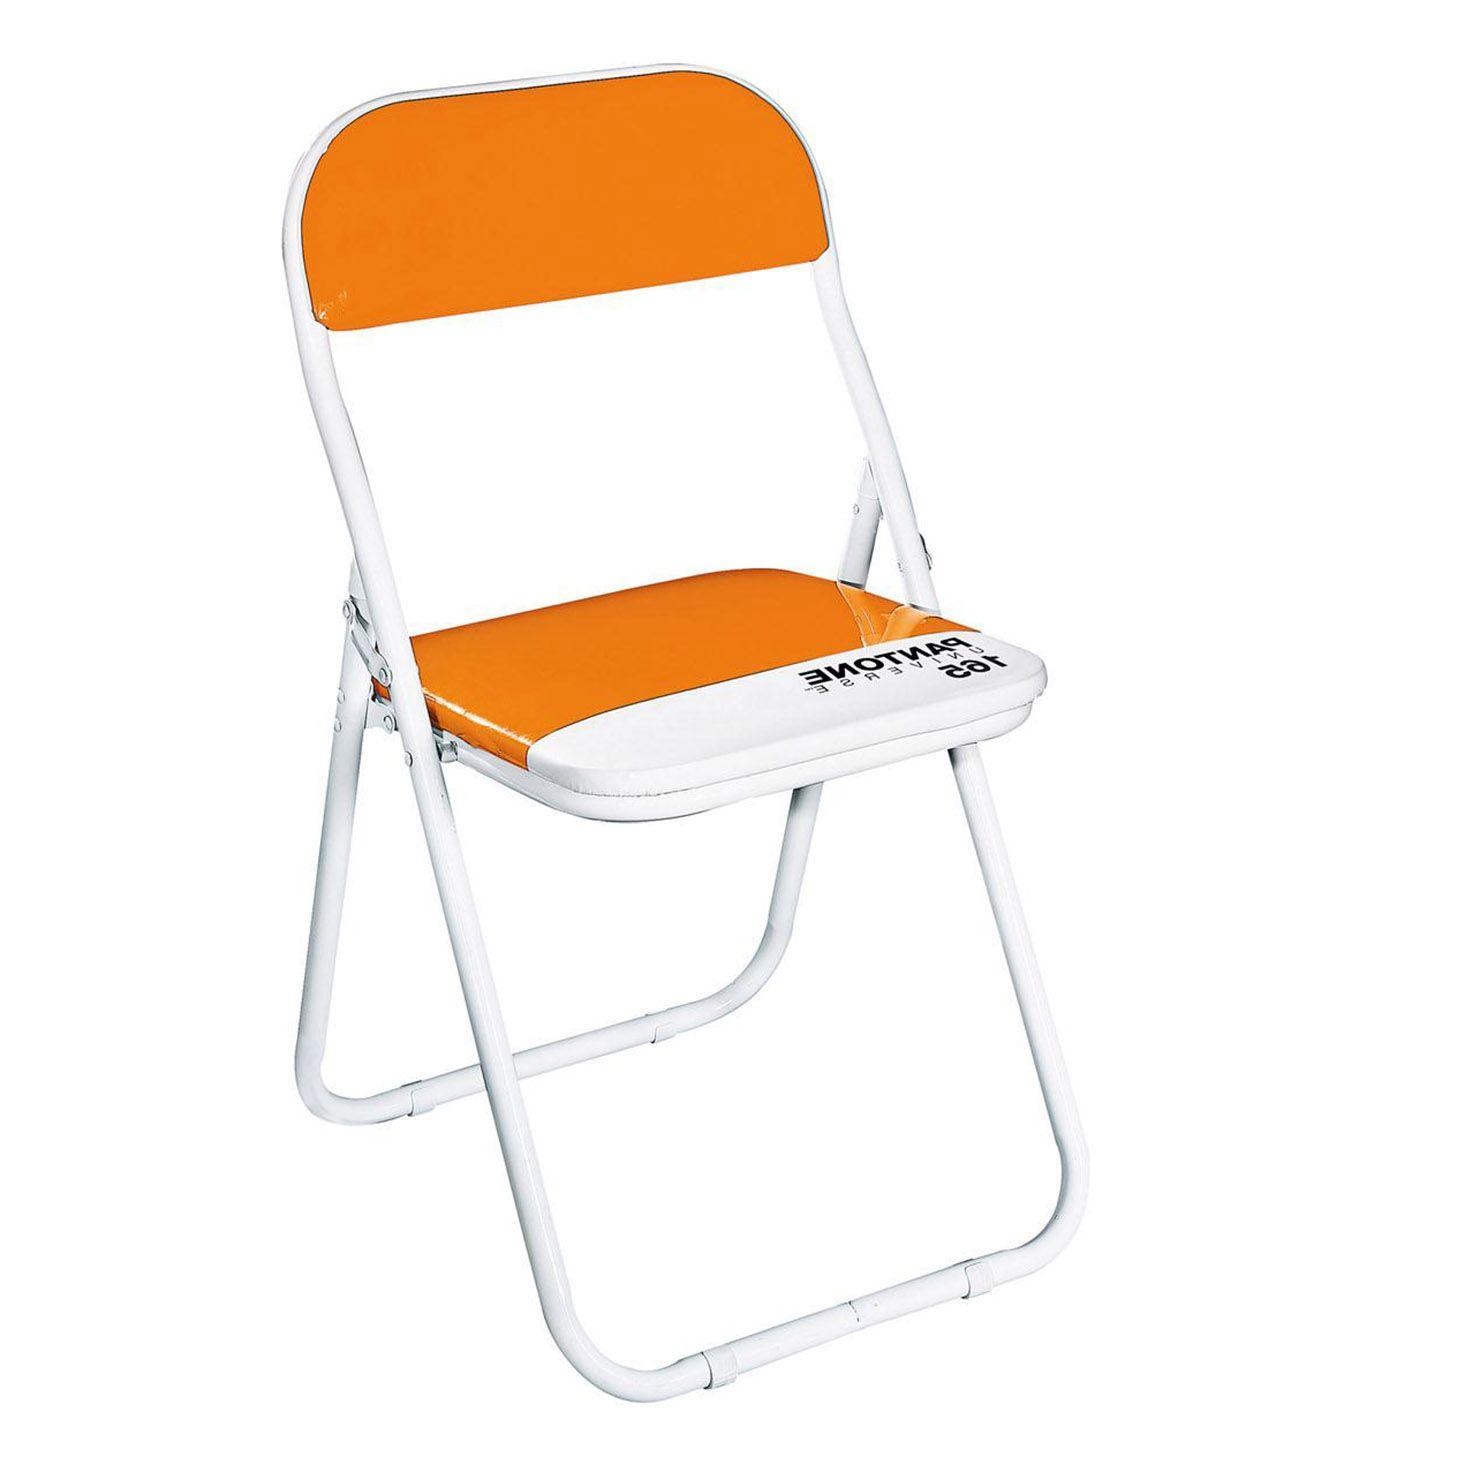 Pantone Chaise Pliante Orange Achica Chaise Pliante Chaise Pantone